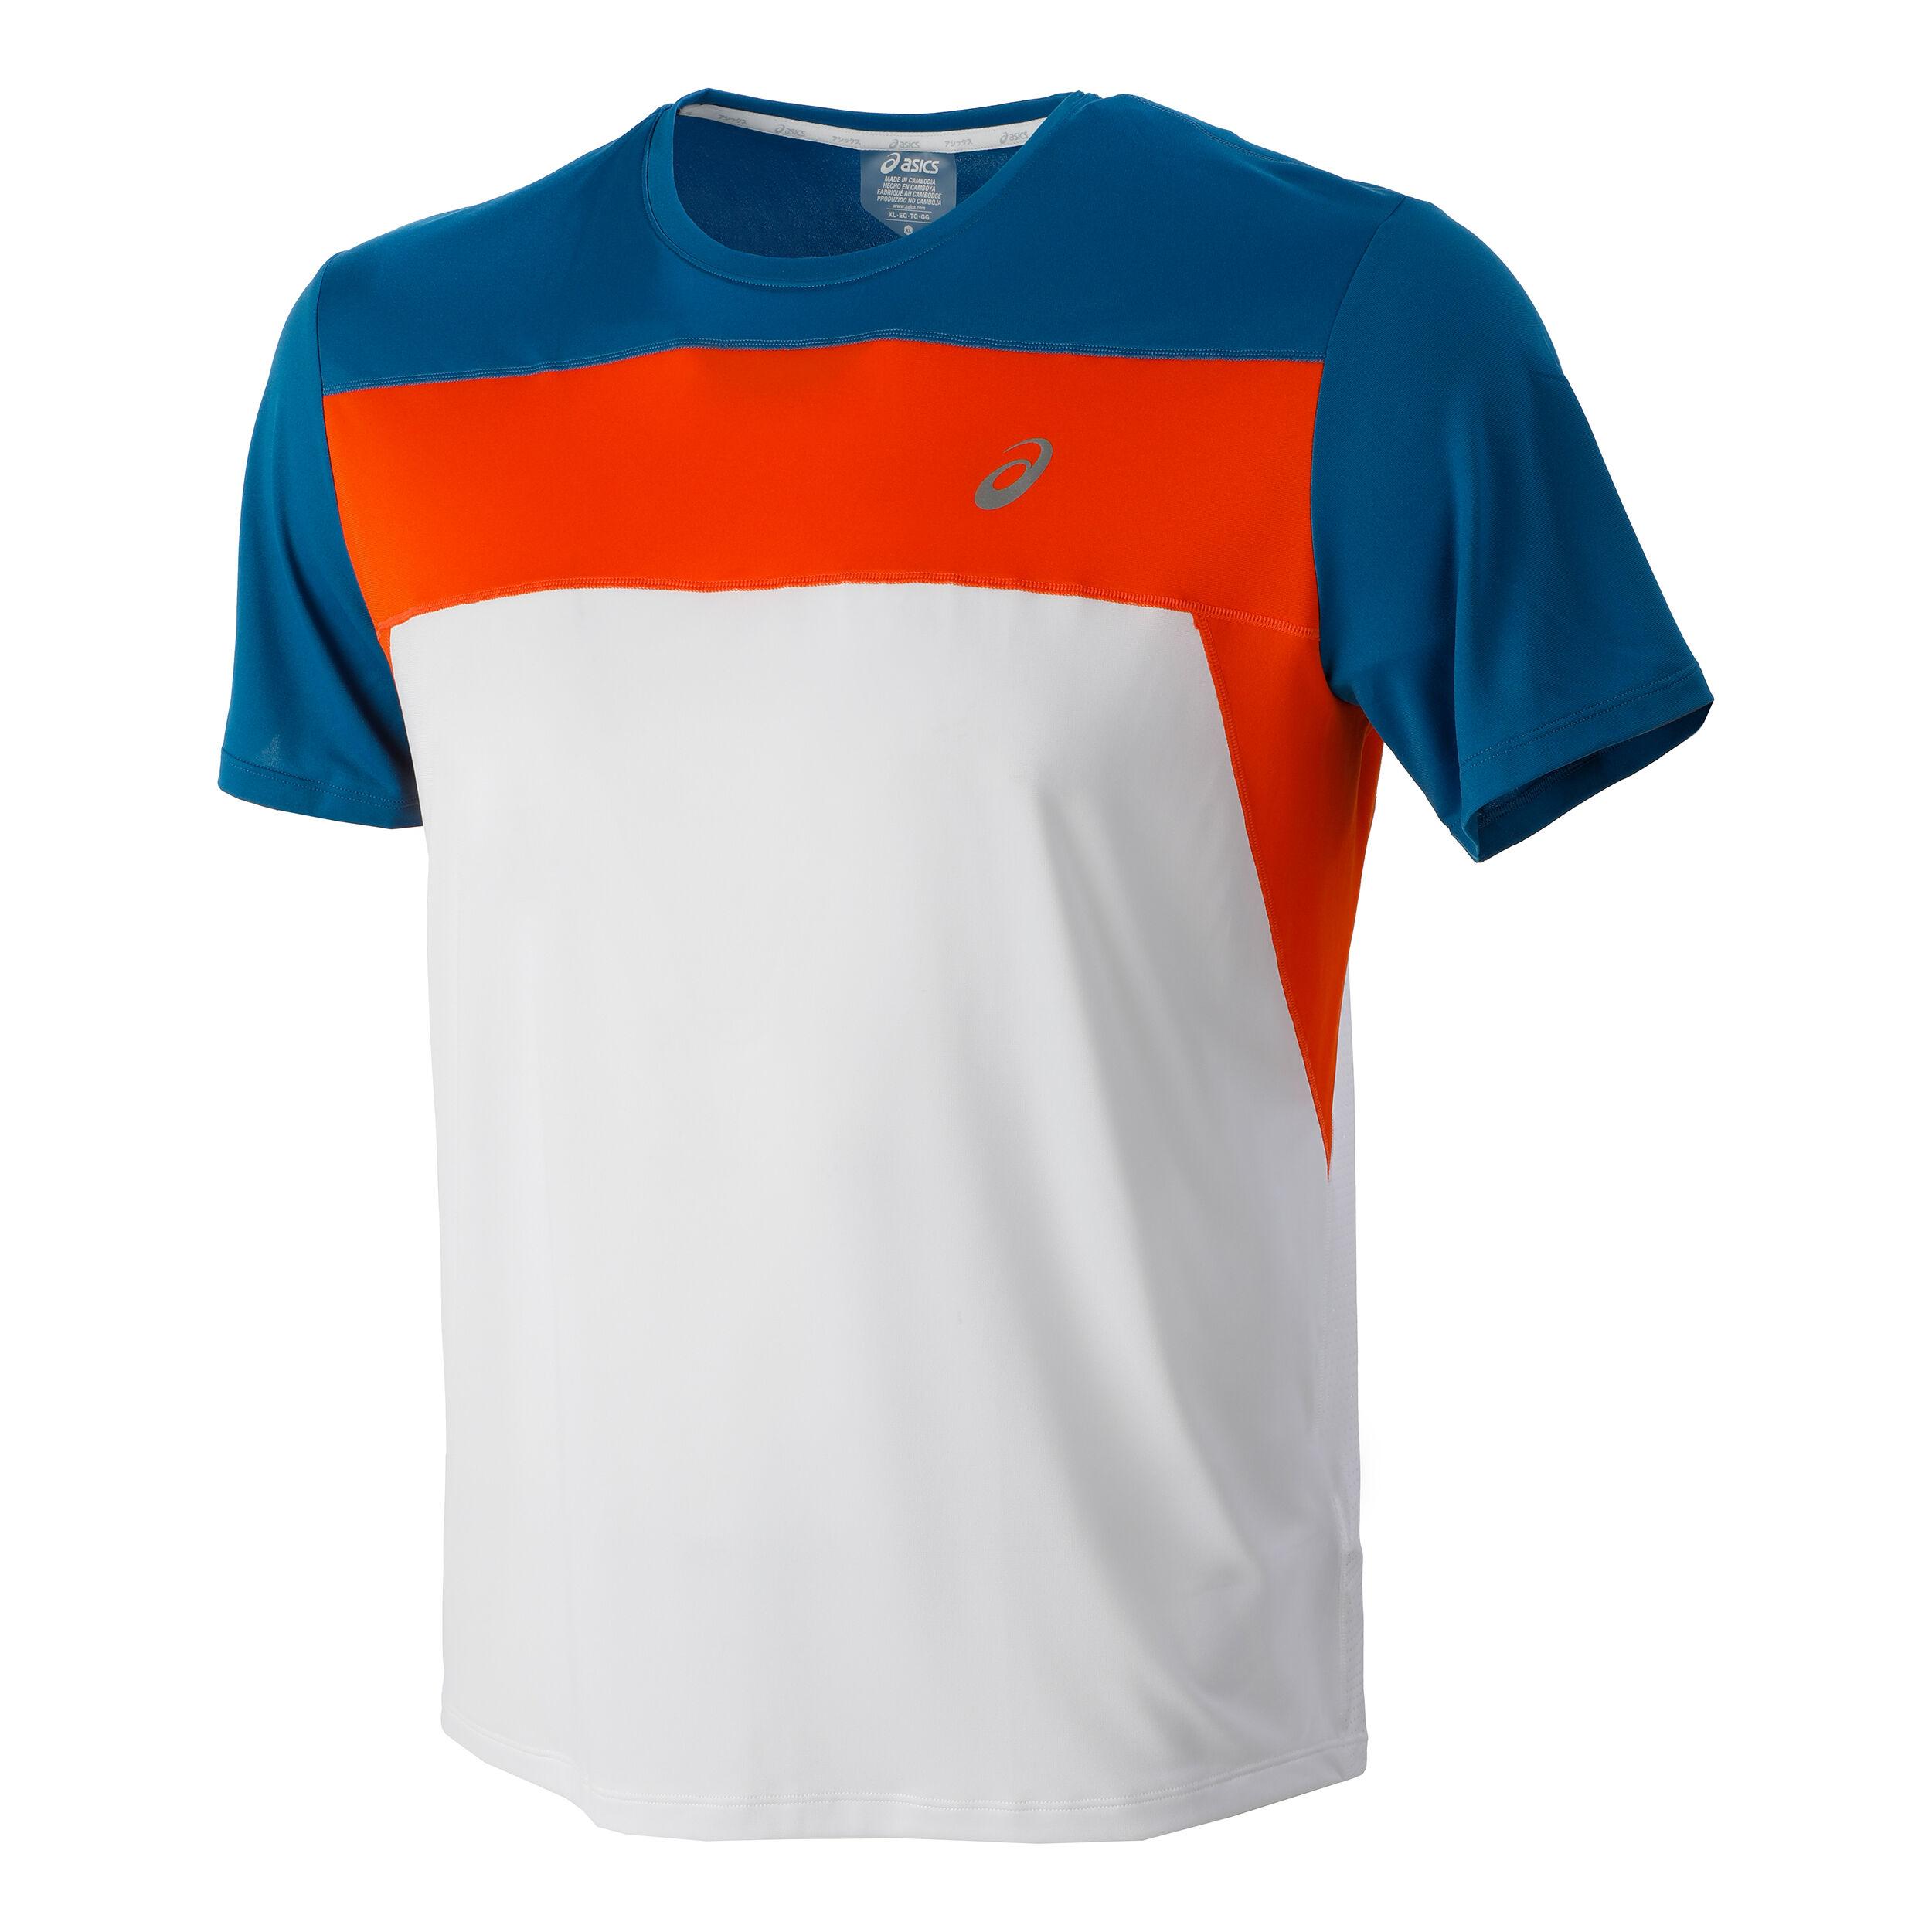 Race T-Shirt Men - White, Blue